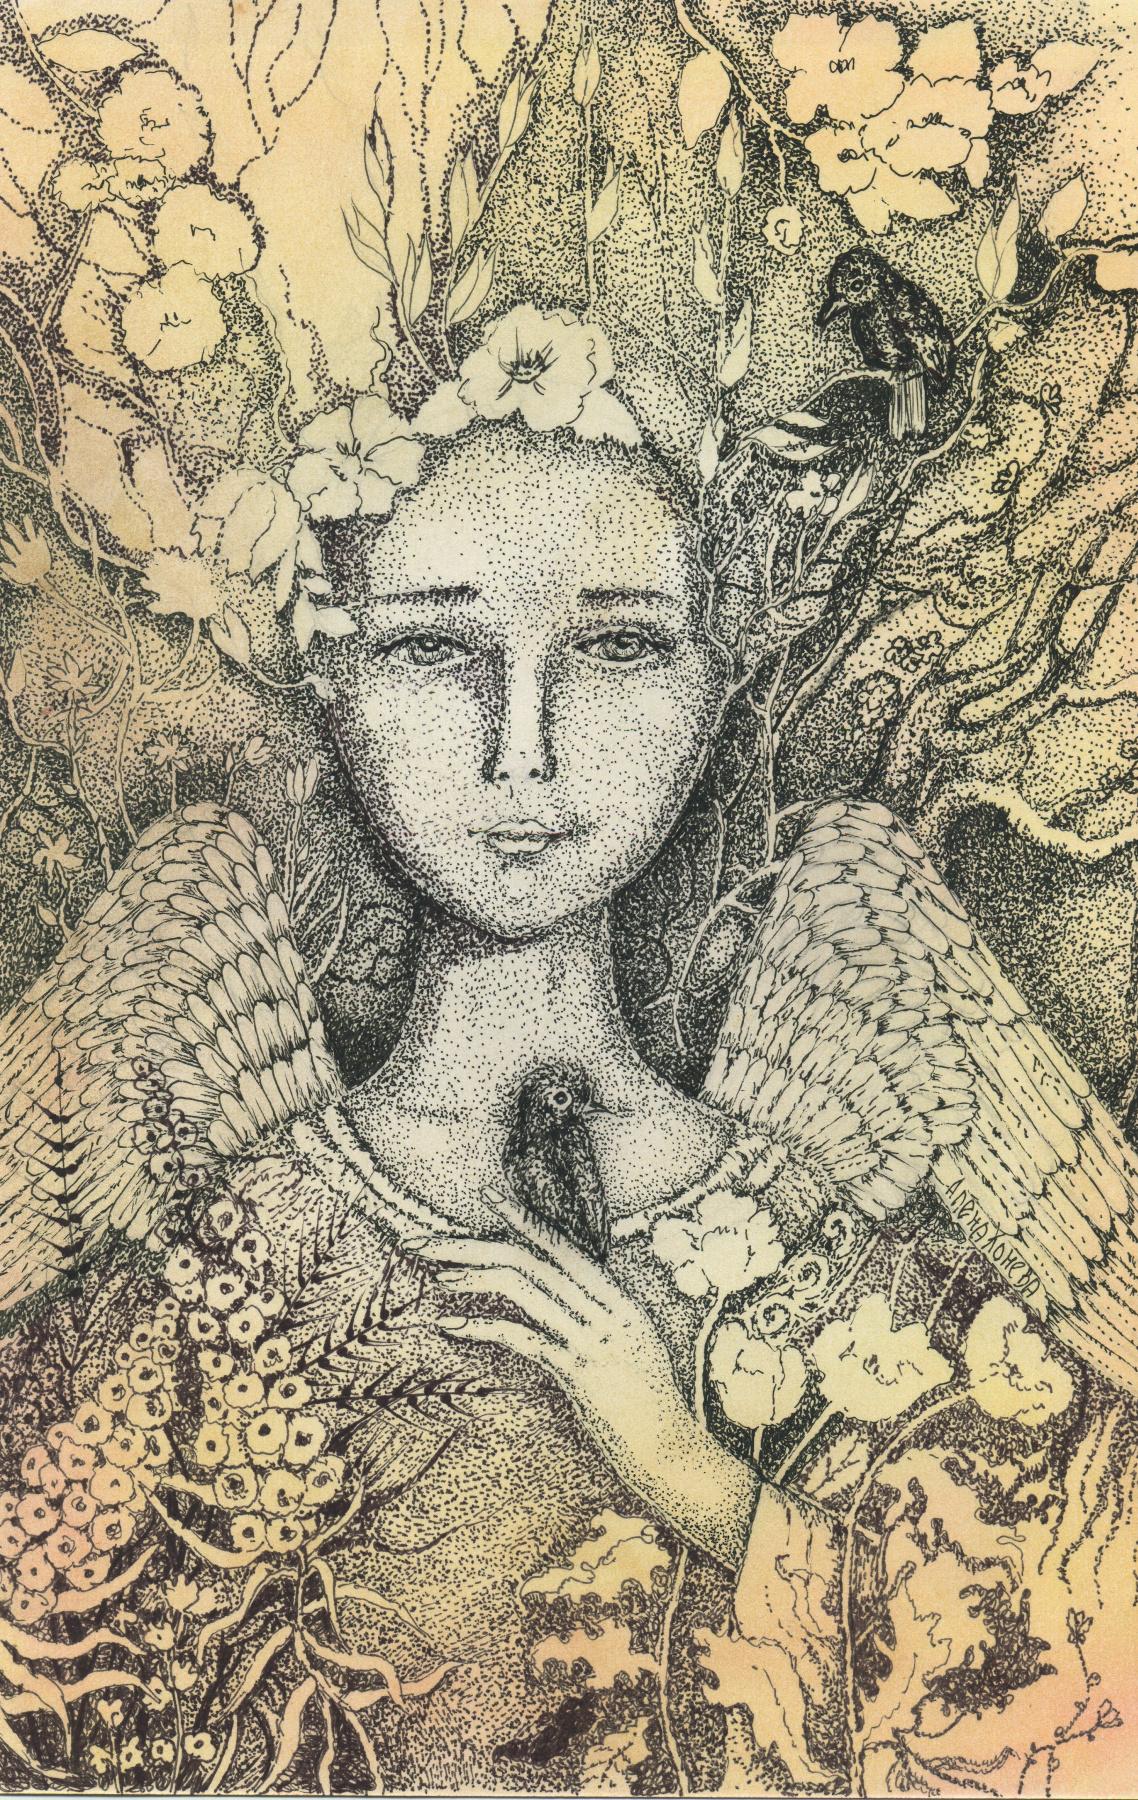 Olyona Ivanovna Koneva. Angel with a bird